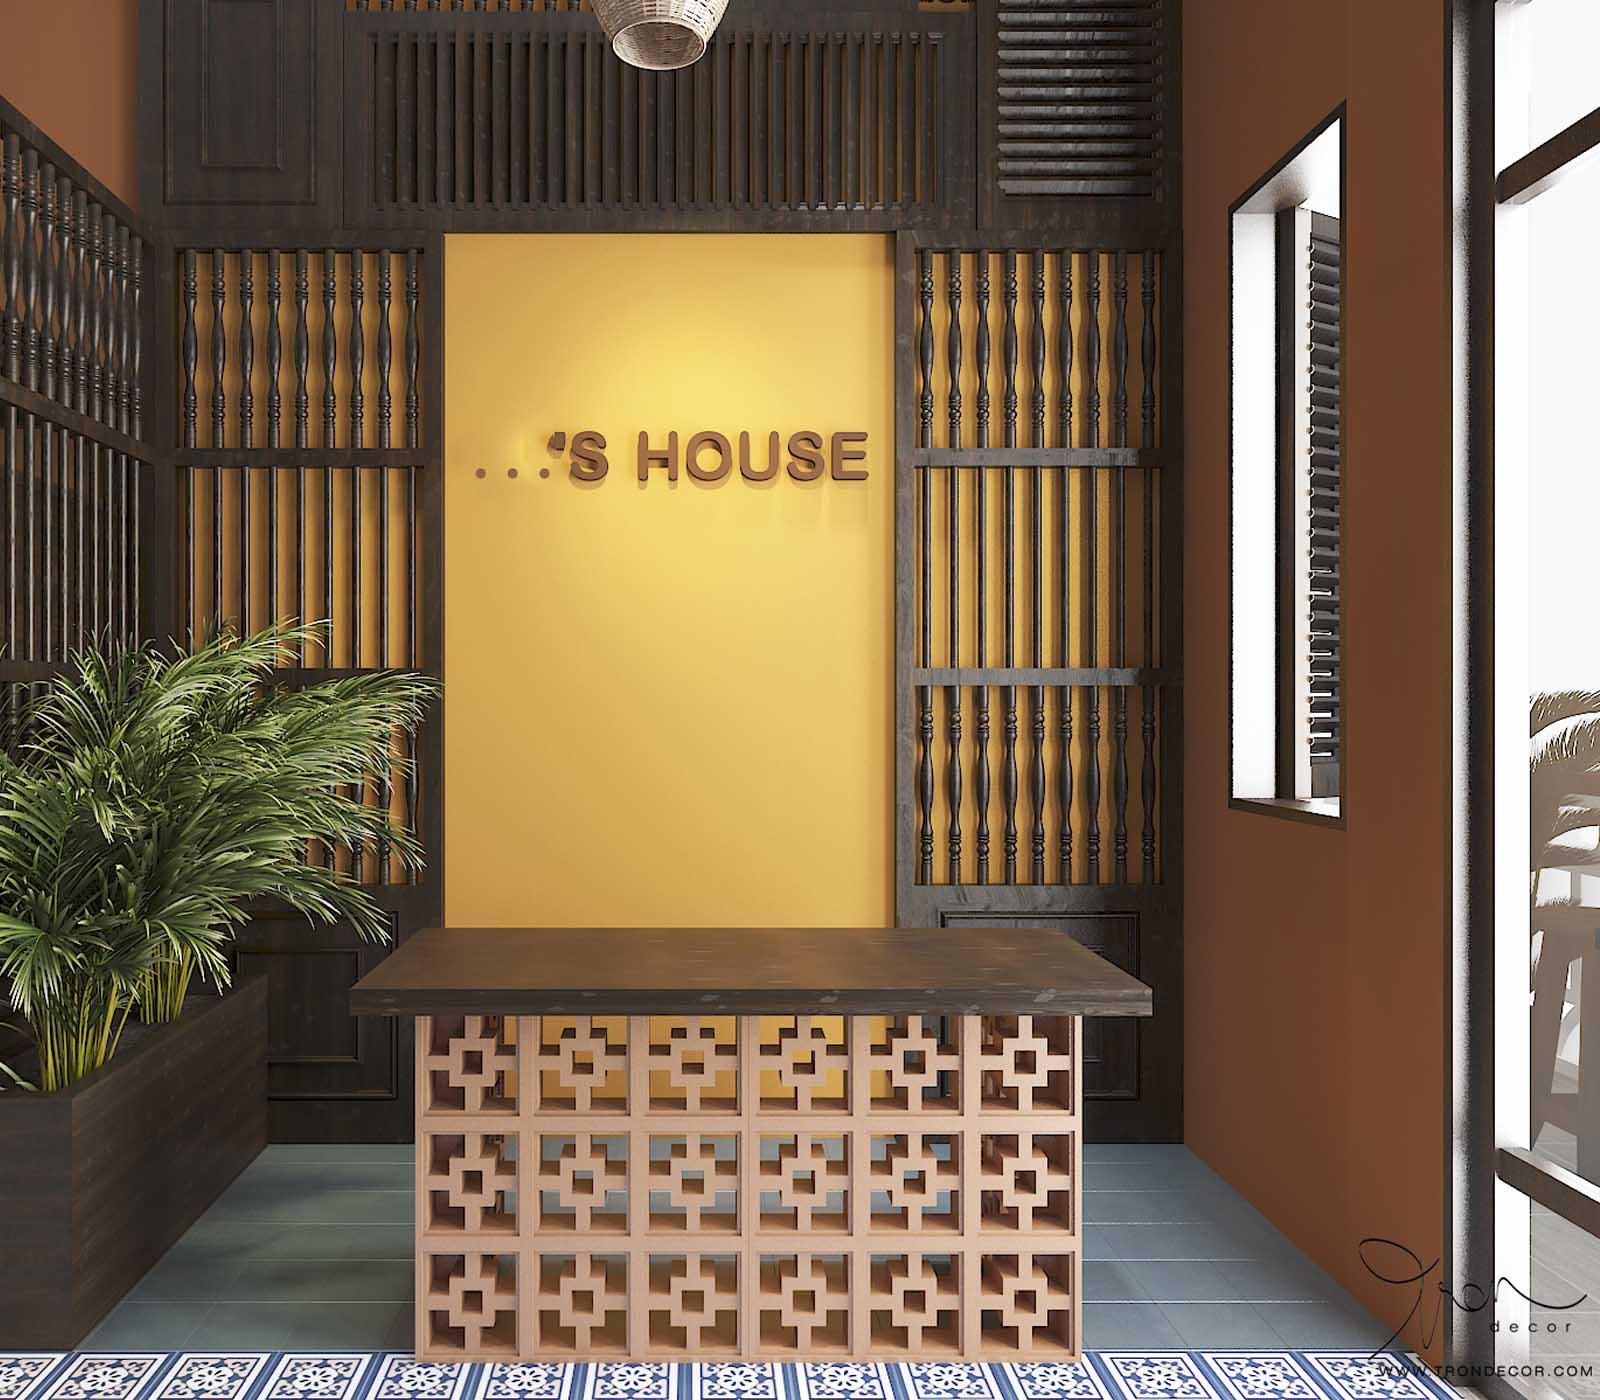 THIẾT KẾ HOMESTAY 120M2 - ...'S HOUSE